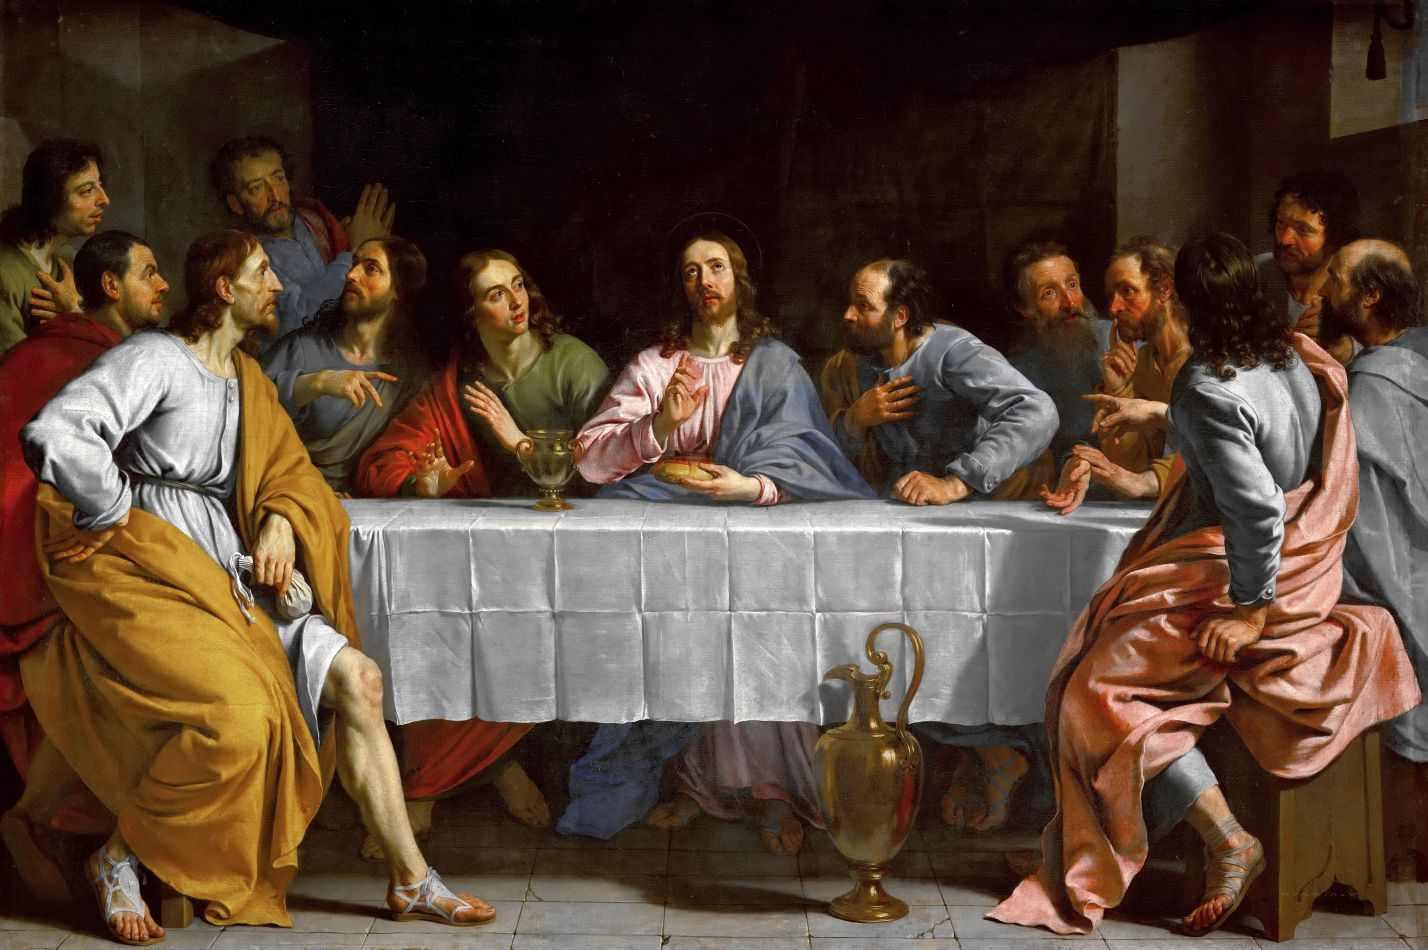 santa ceia 1652 de philippe de champaigne tela para quadro na santhatela santa ceia 1652 de philippe de champaigne tela para quadro na santhatela